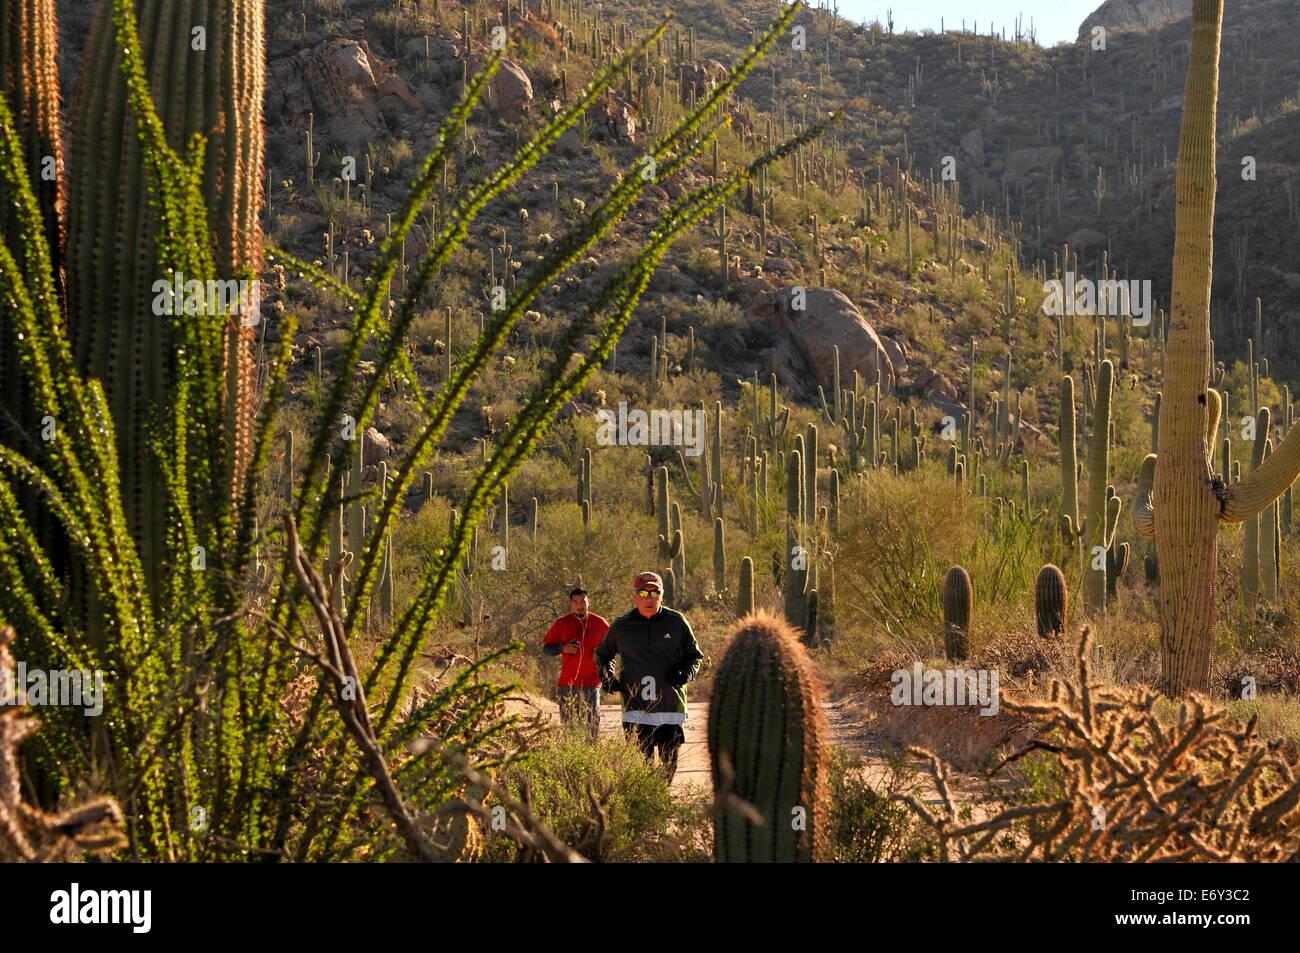 Runners and cyclists race on Bajada Loop Drive in Saguaro National Park West, Sonoran Desert, Tucson, Arizona, USA. - Stock Image